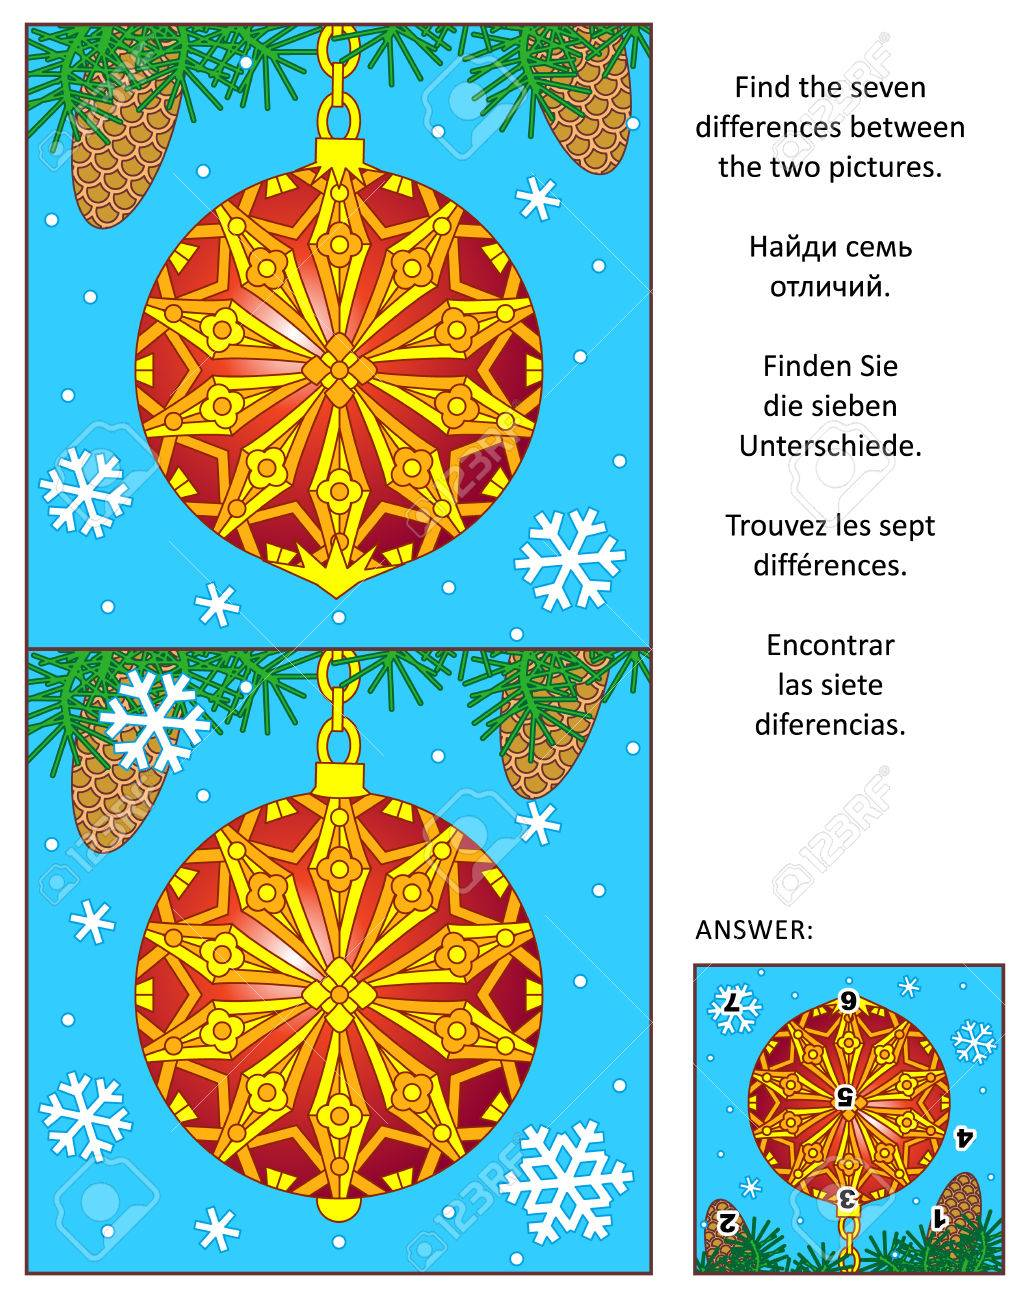 Rätsel Weihnachten Erwachsene.Stock Photo